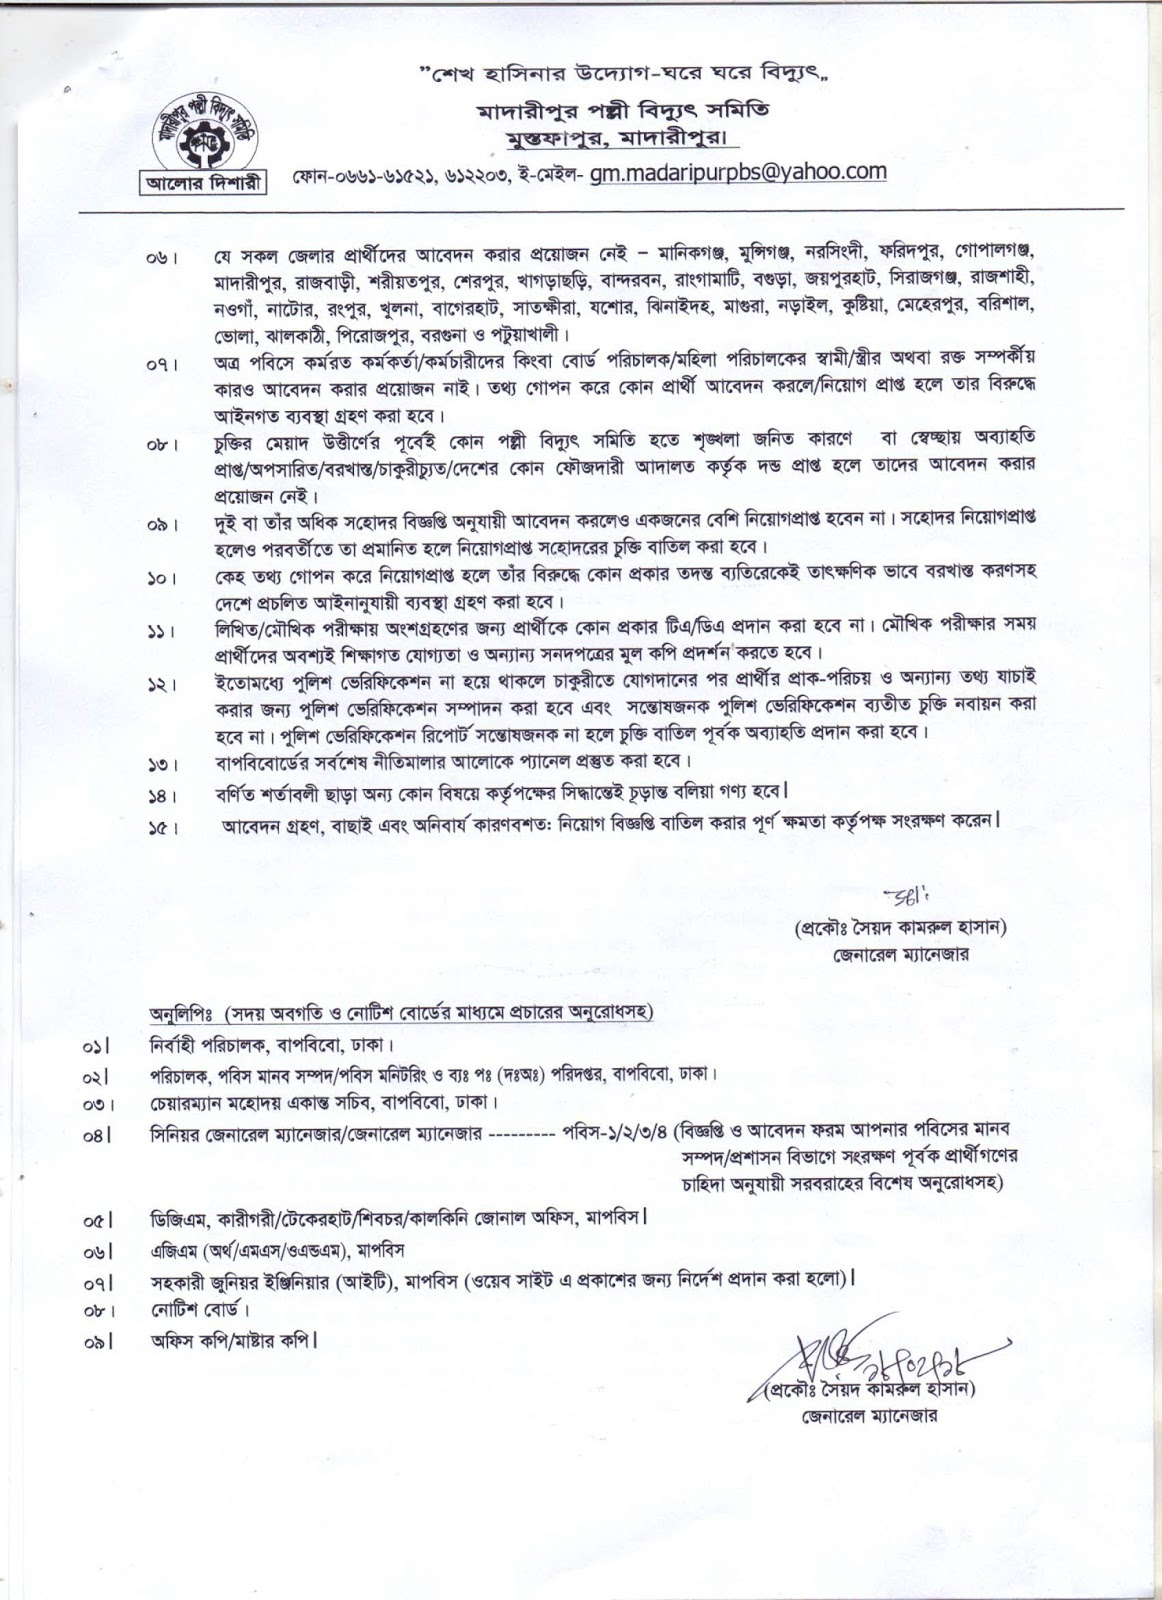 Madaripur Palli Bidyut Samity Job Circular 2018